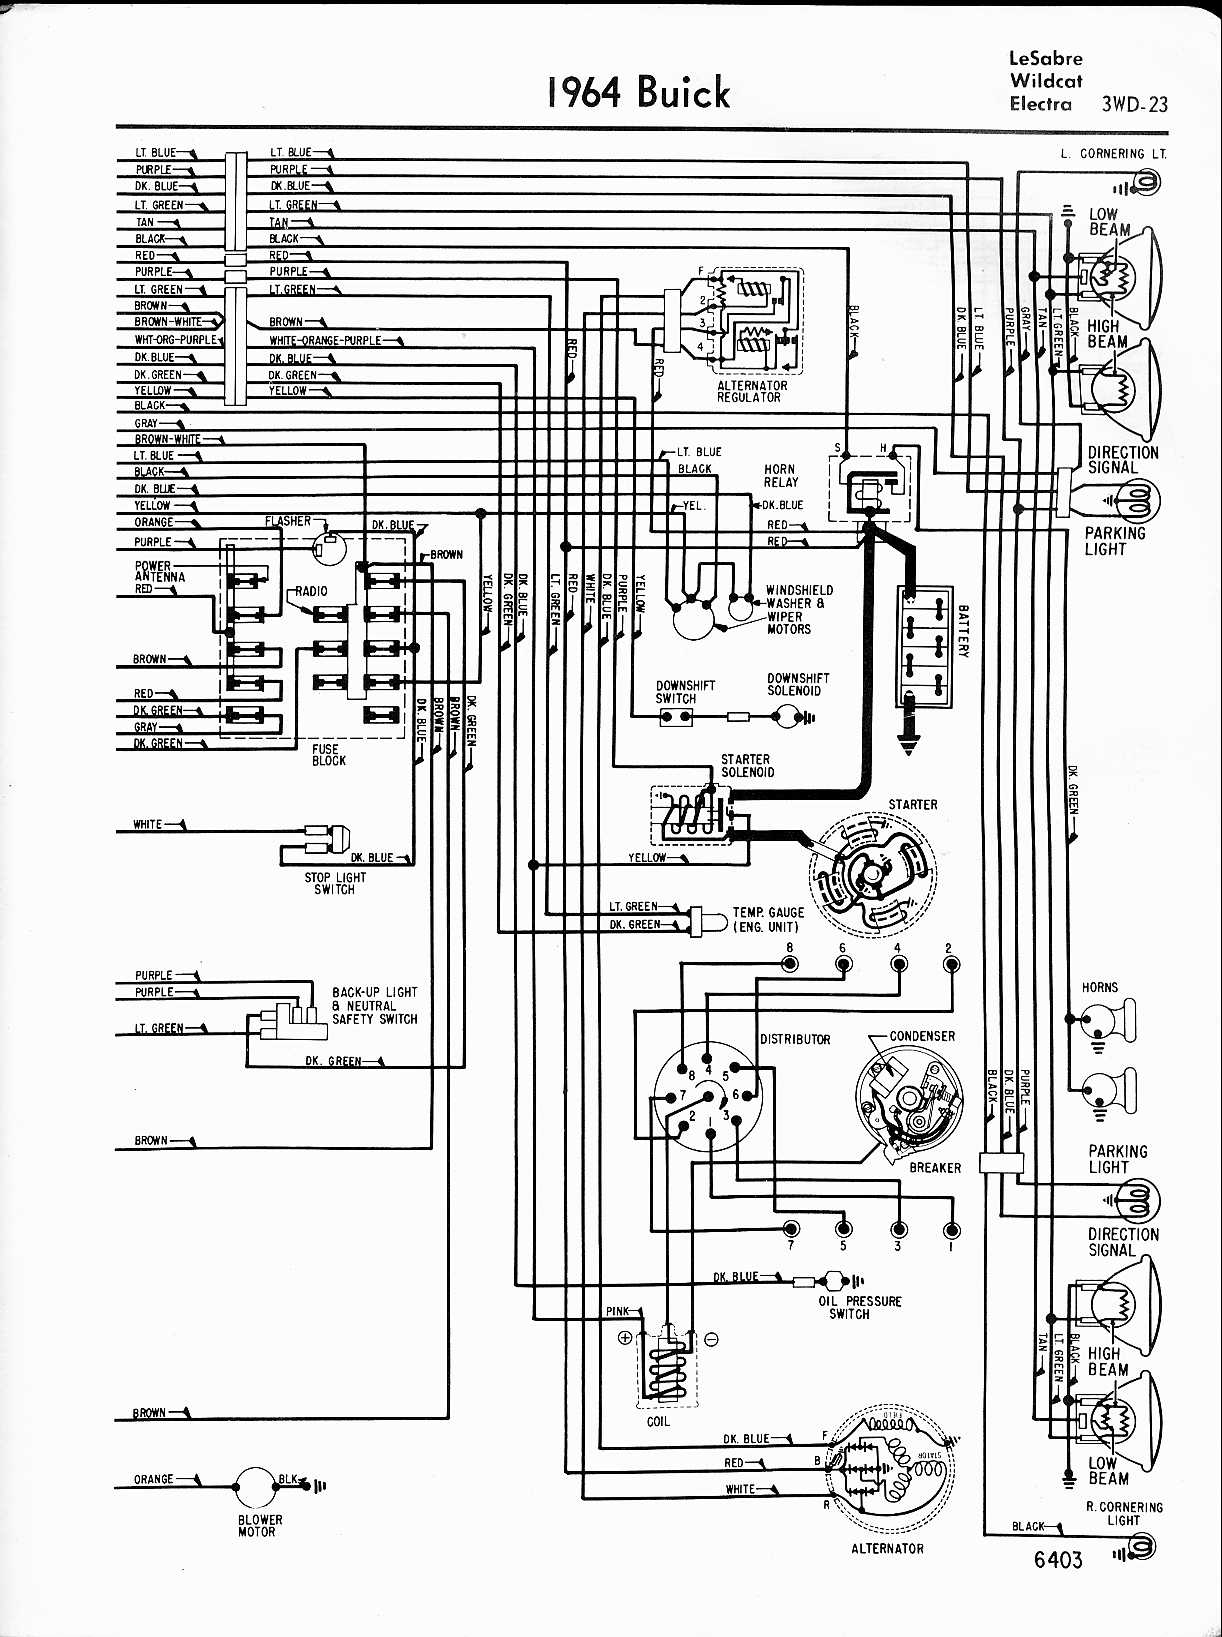 honda ca77 wiring diagram wiring library. Black Bedroom Furniture Sets. Home Design Ideas